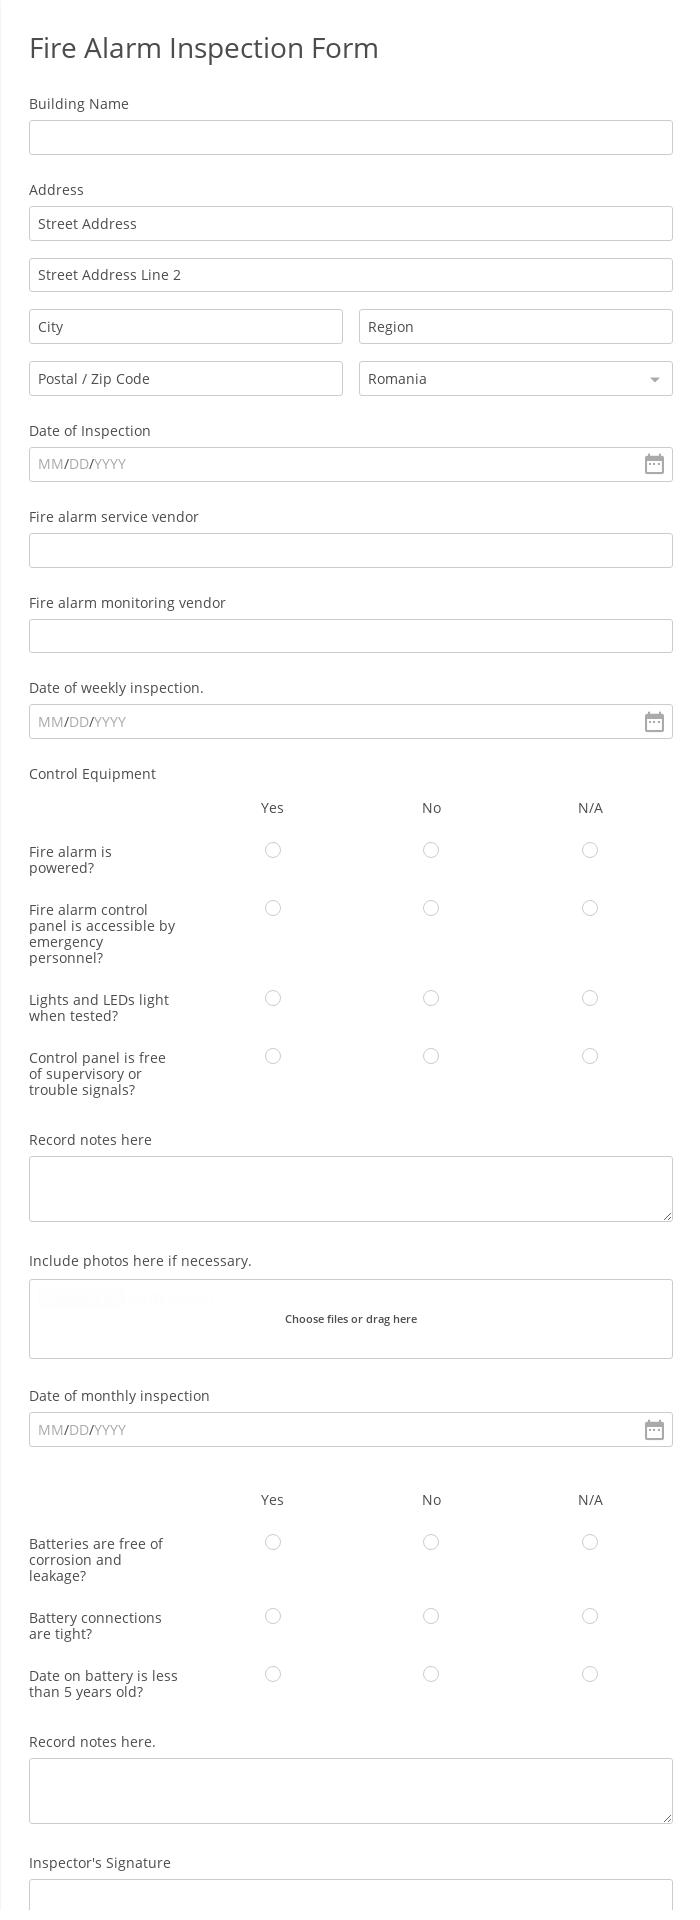 Fire Alarm Inspection Form